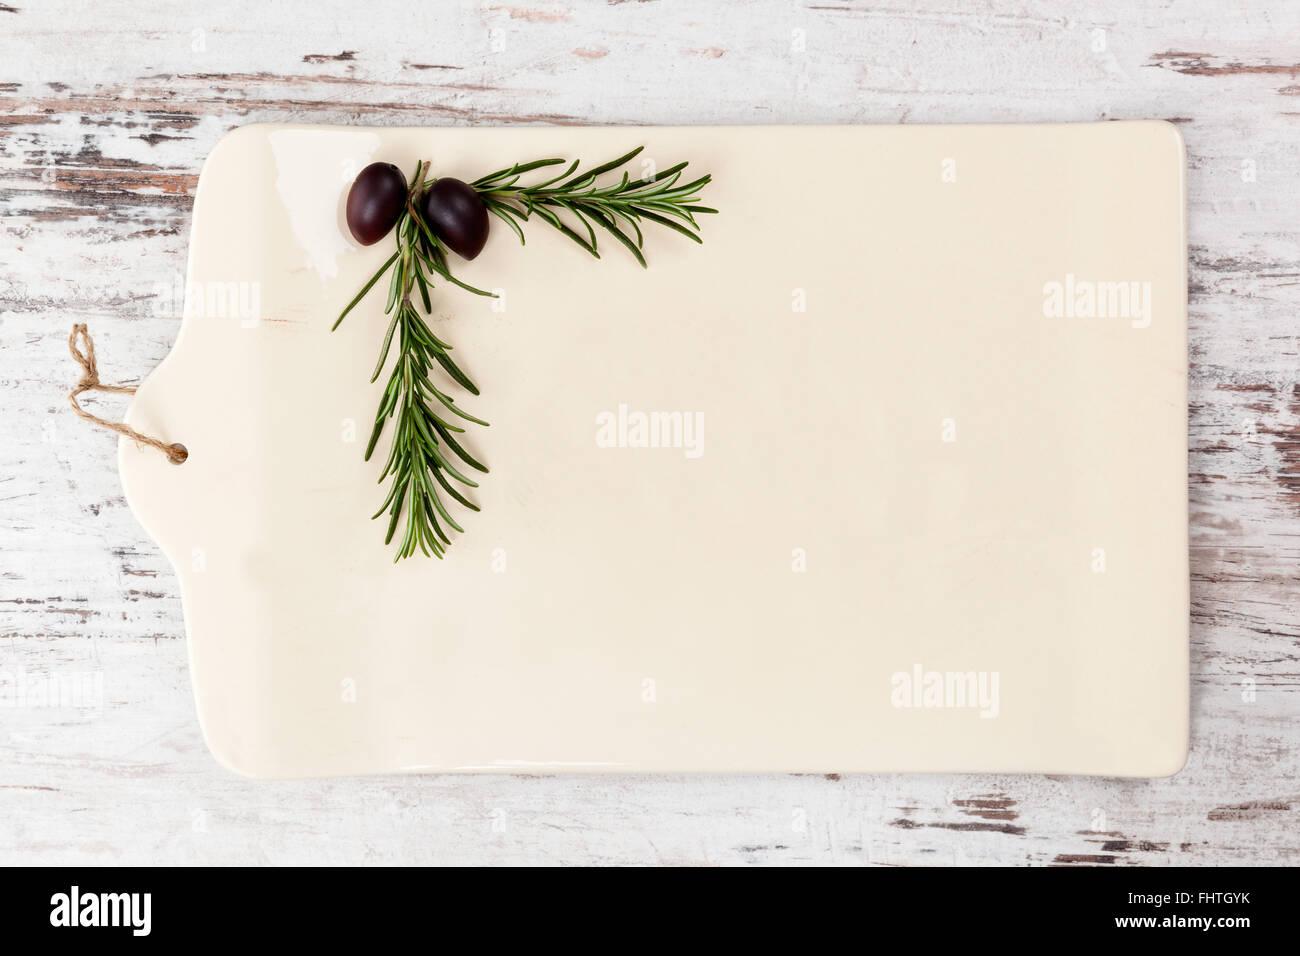 Country Style Kitchen Stockfotos & Country Style Kitchen Bilder - Alamy